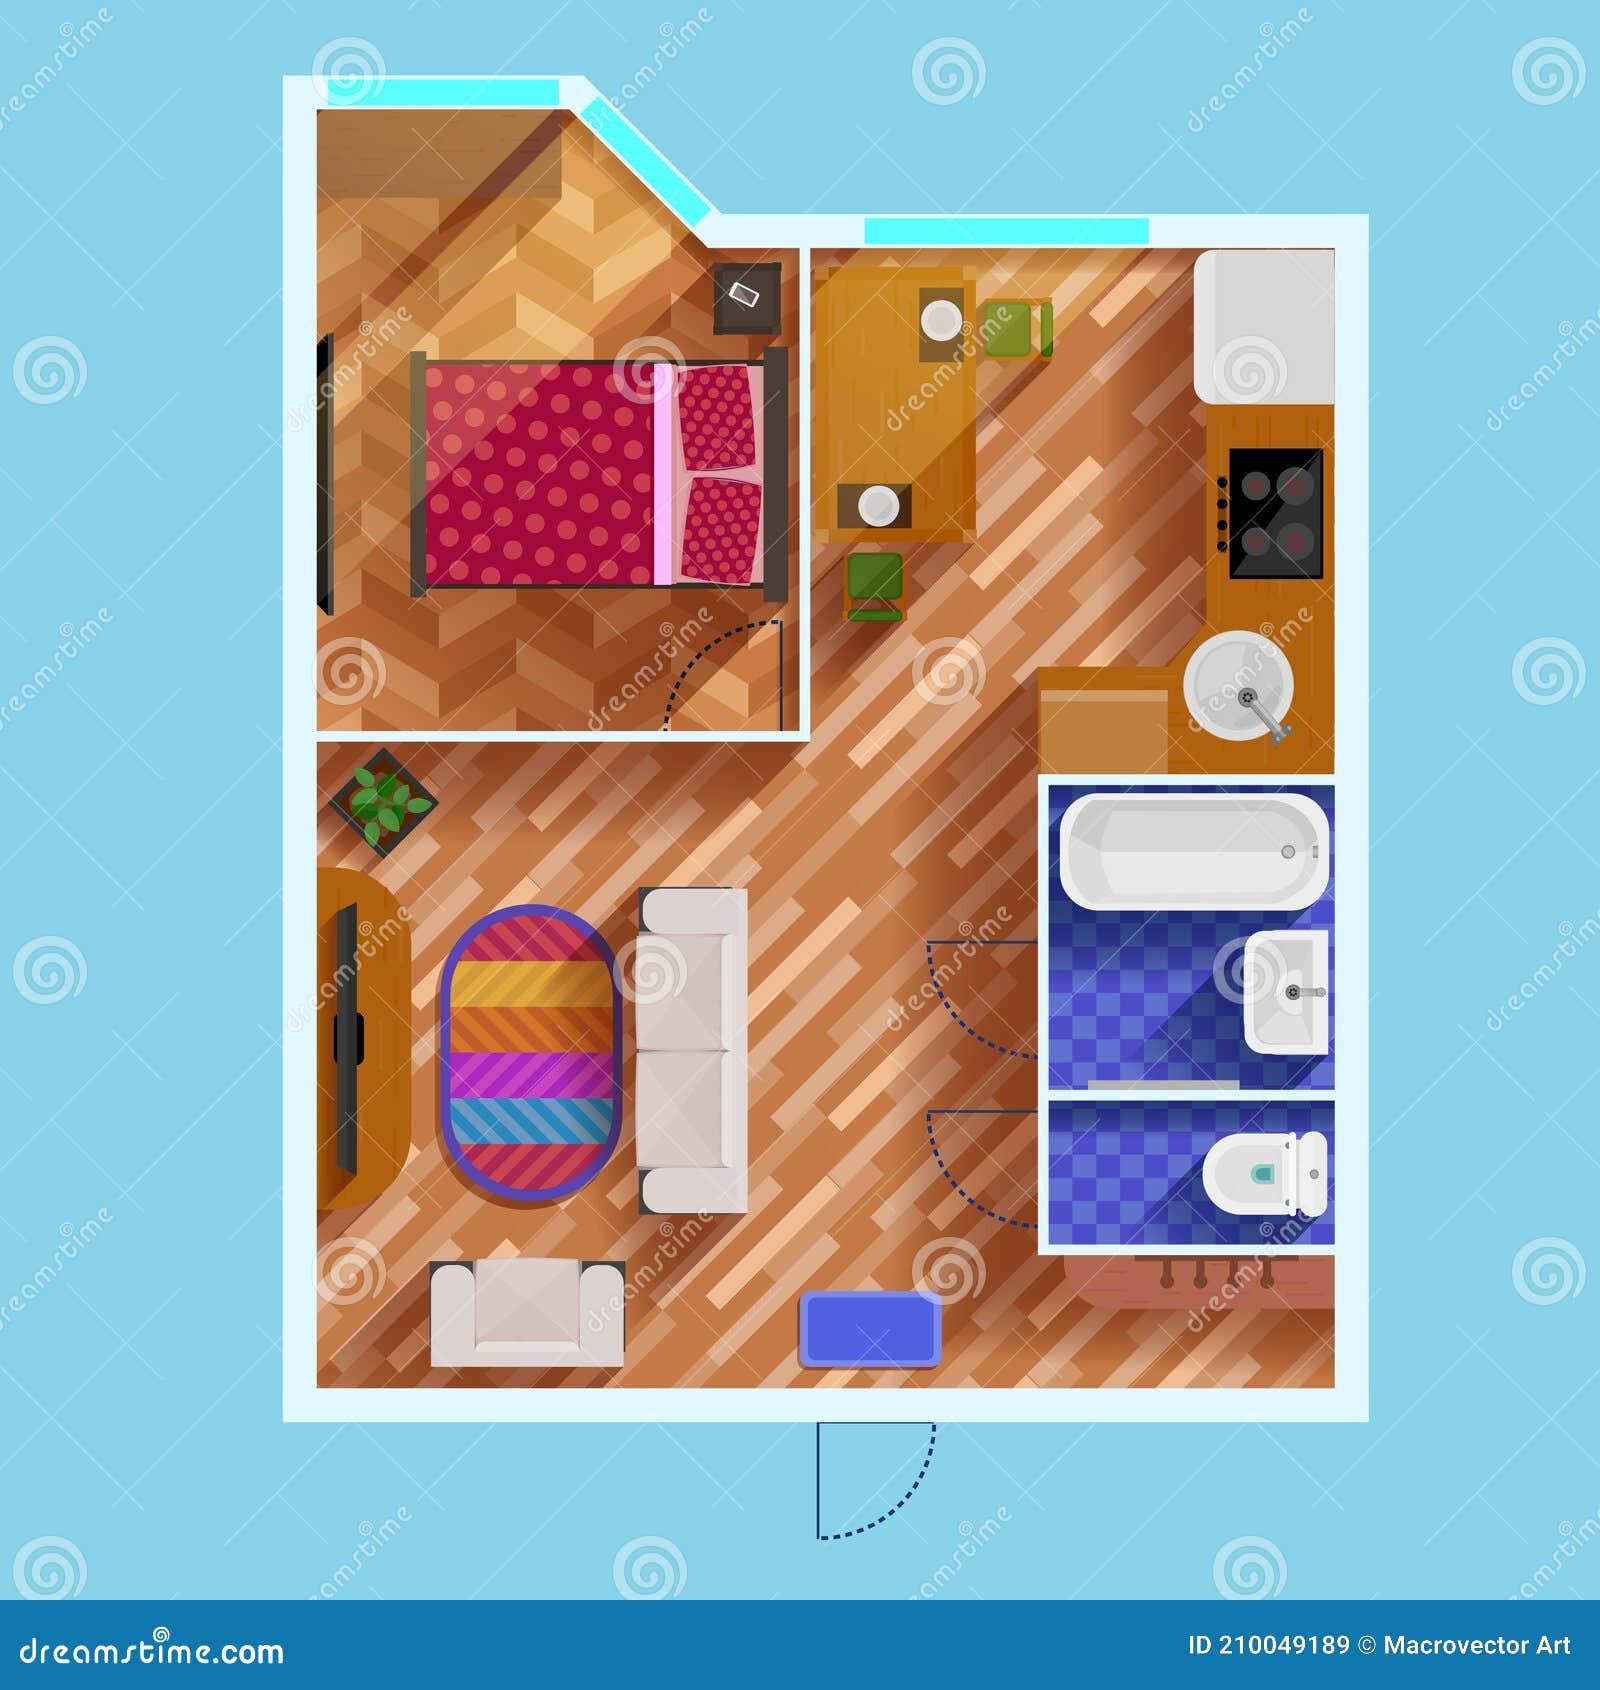 Floor Plan Of One Bedroom Apartment Stock Vector Illustration Of Furniture Decorative 210049189